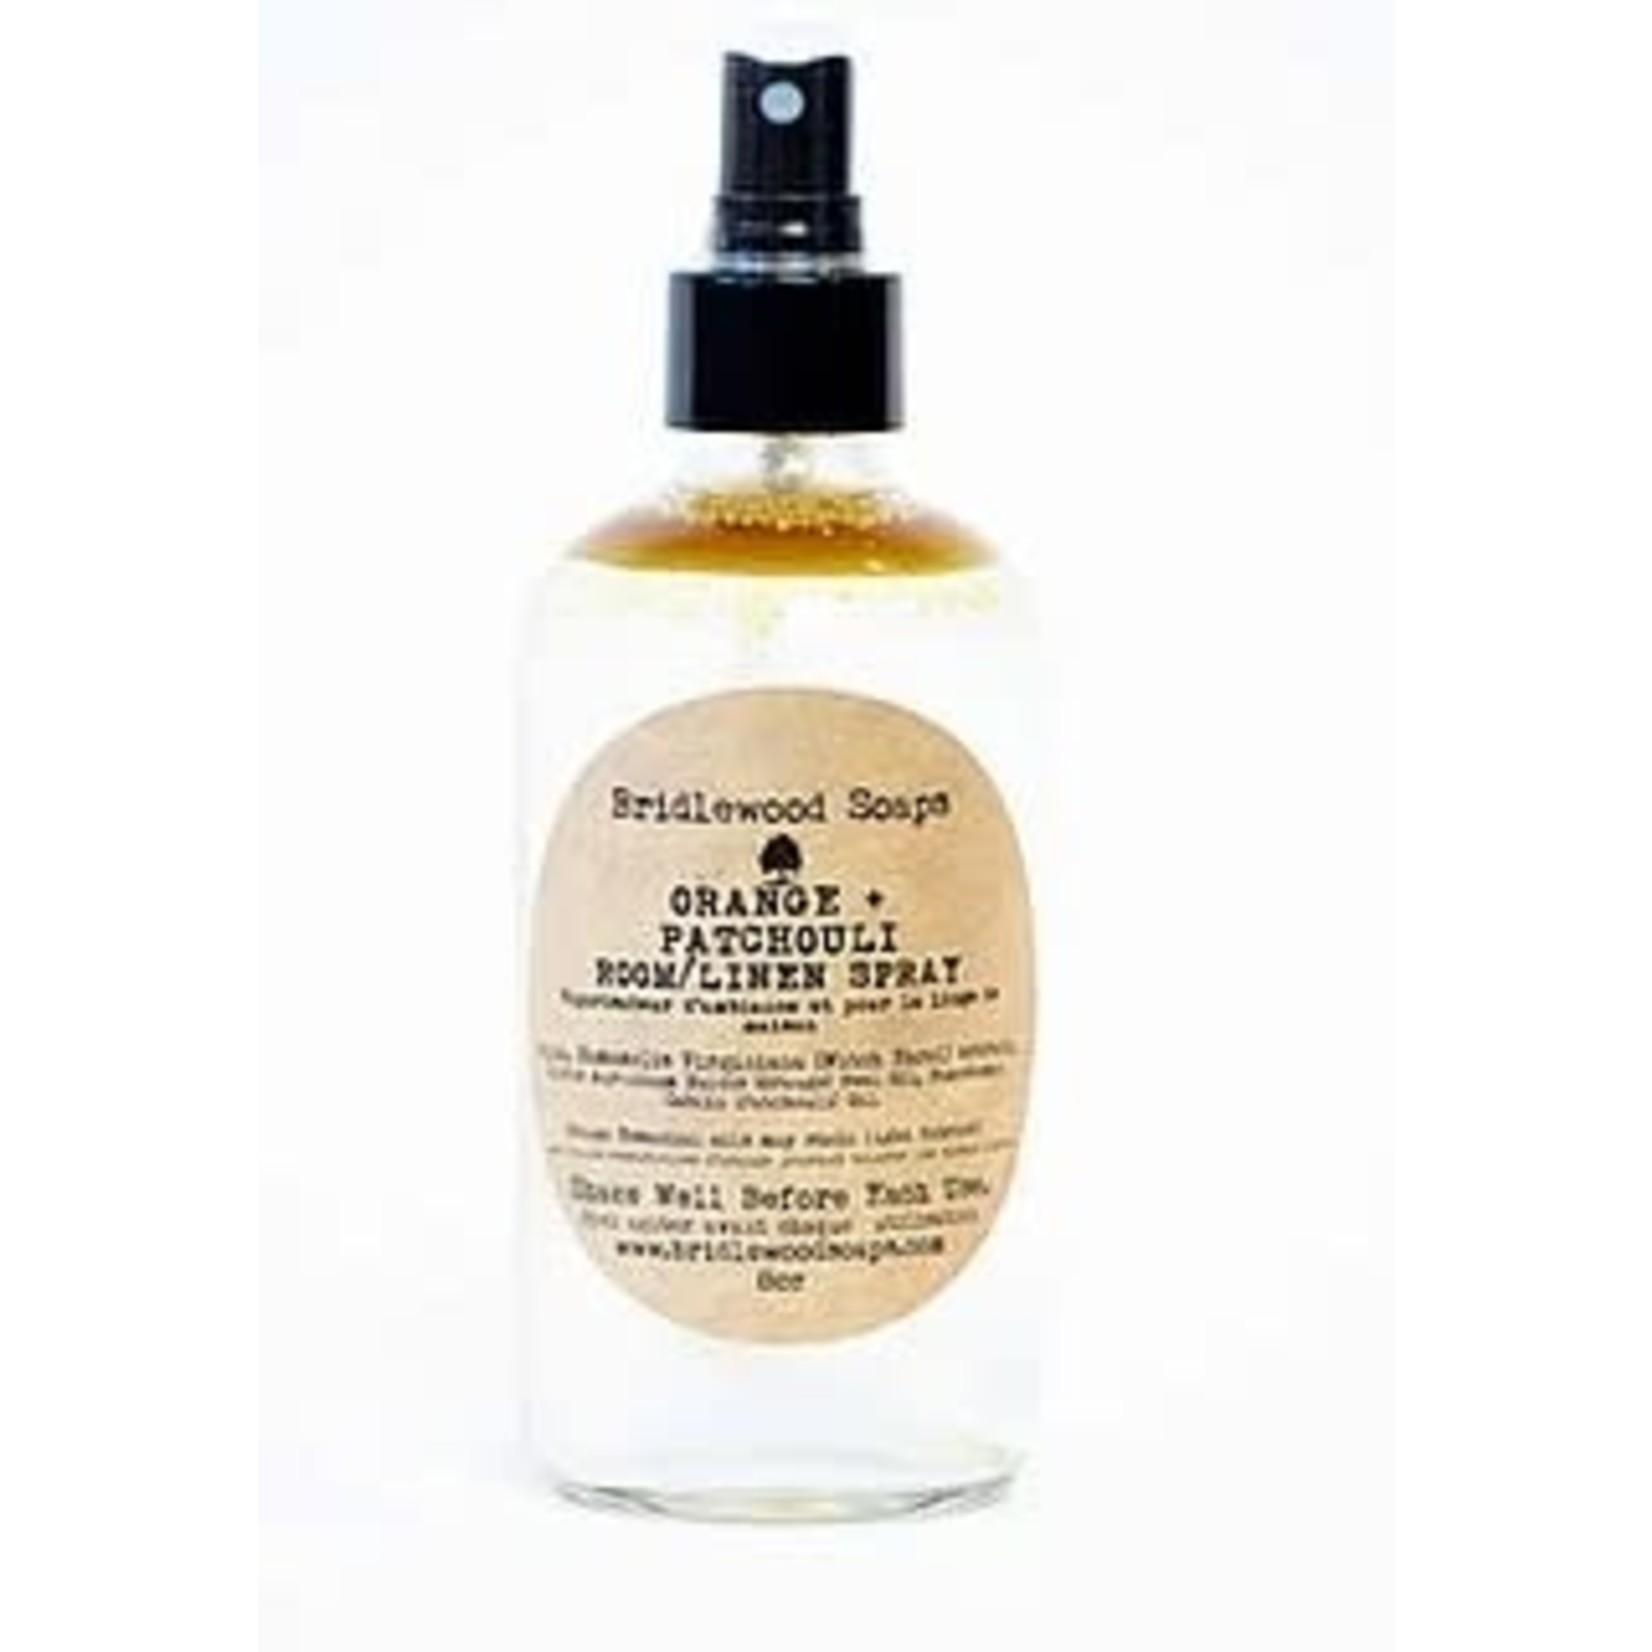 Bridlewood Soaps Bridlewood Linen and Room Sprays